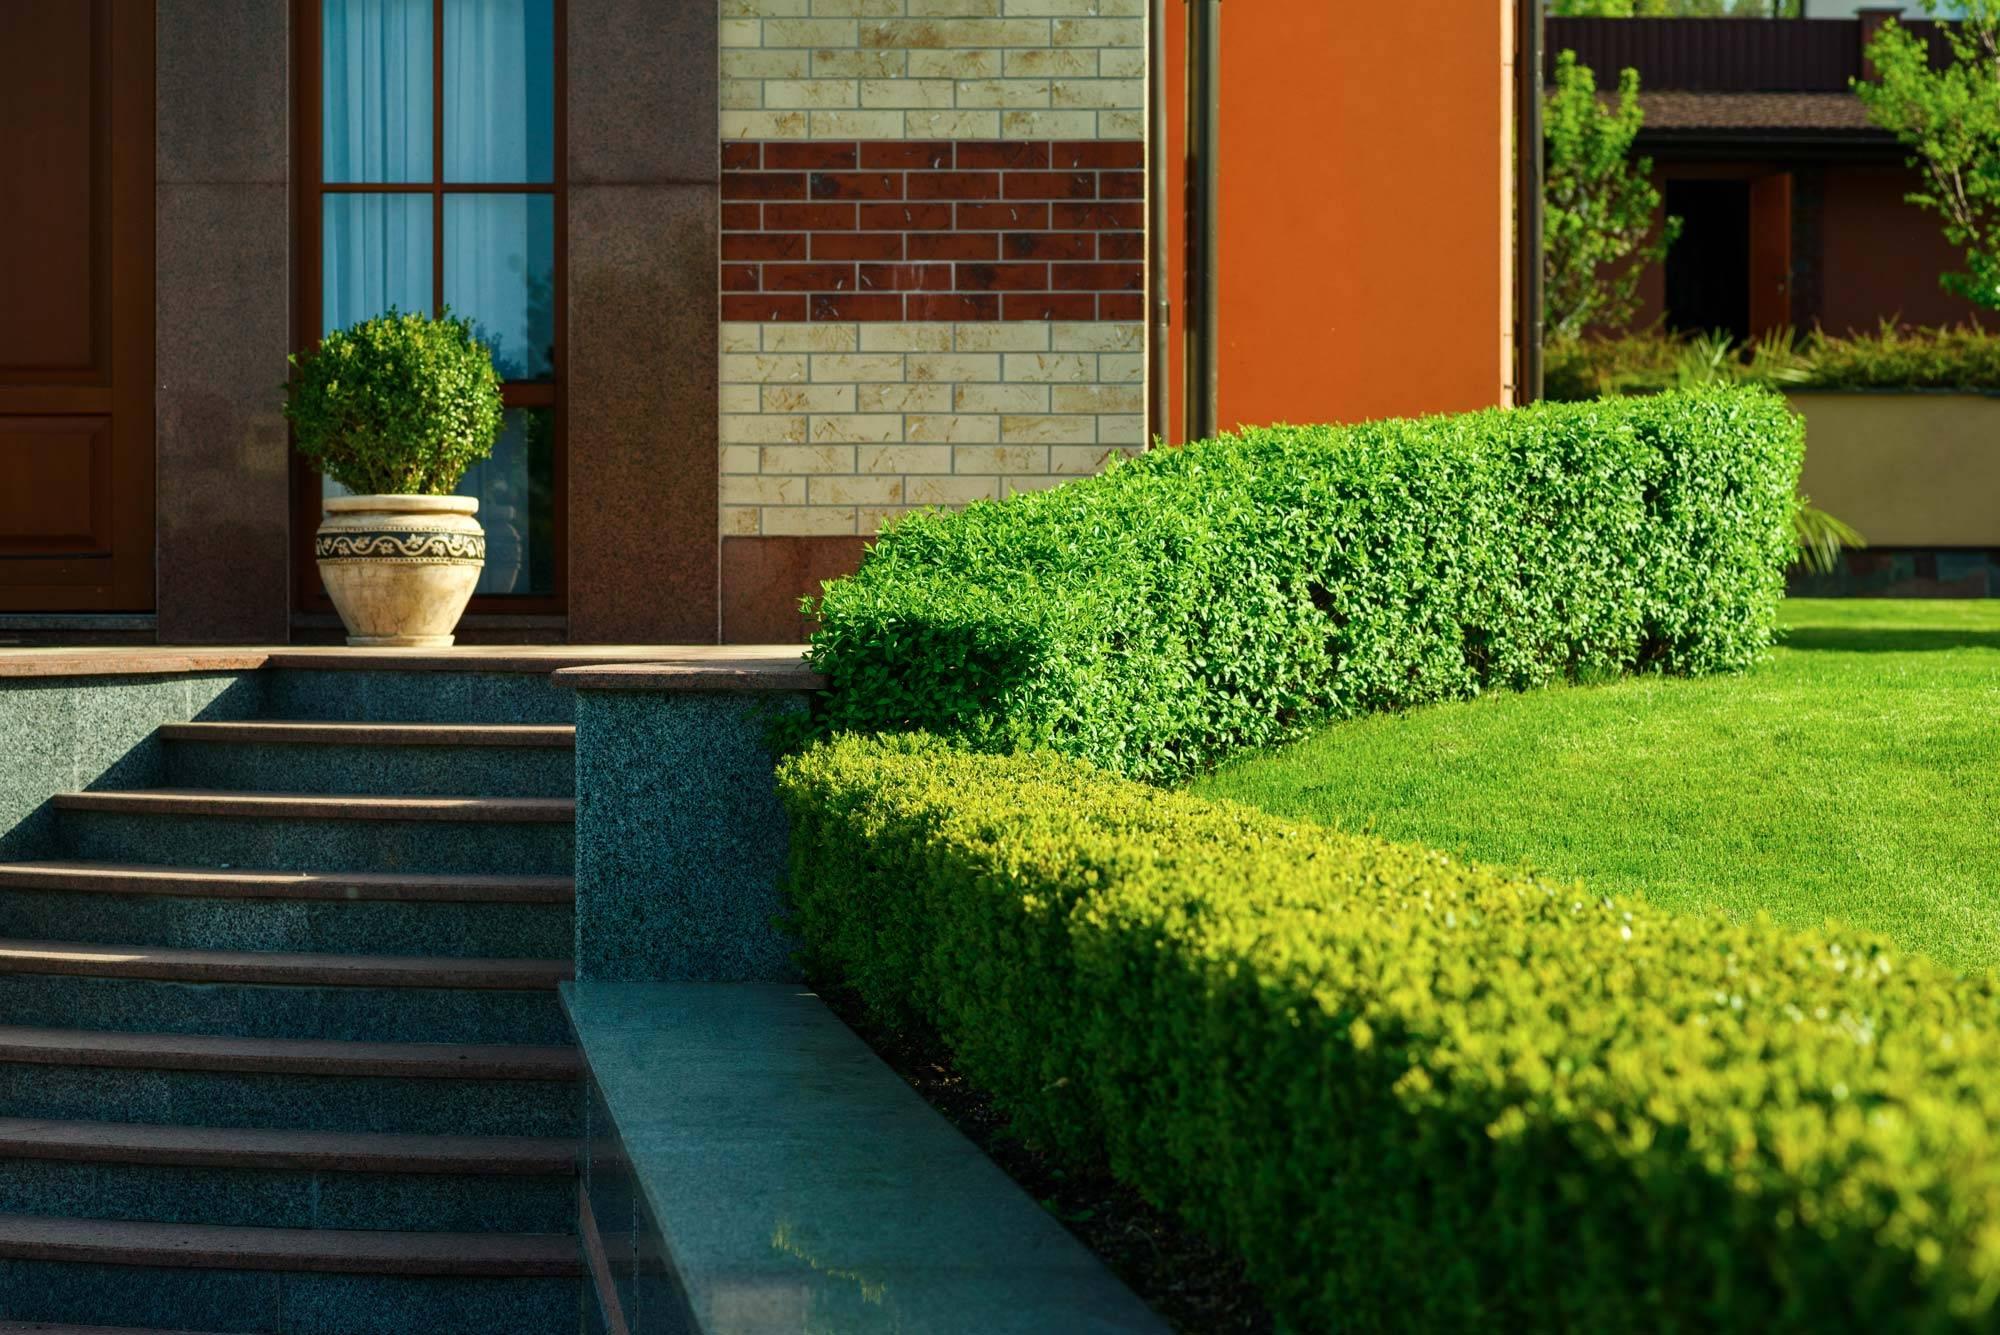 jardinier paysagiste et am nagement jardin bouc bel air jeanselme paysage. Black Bedroom Furniture Sets. Home Design Ideas